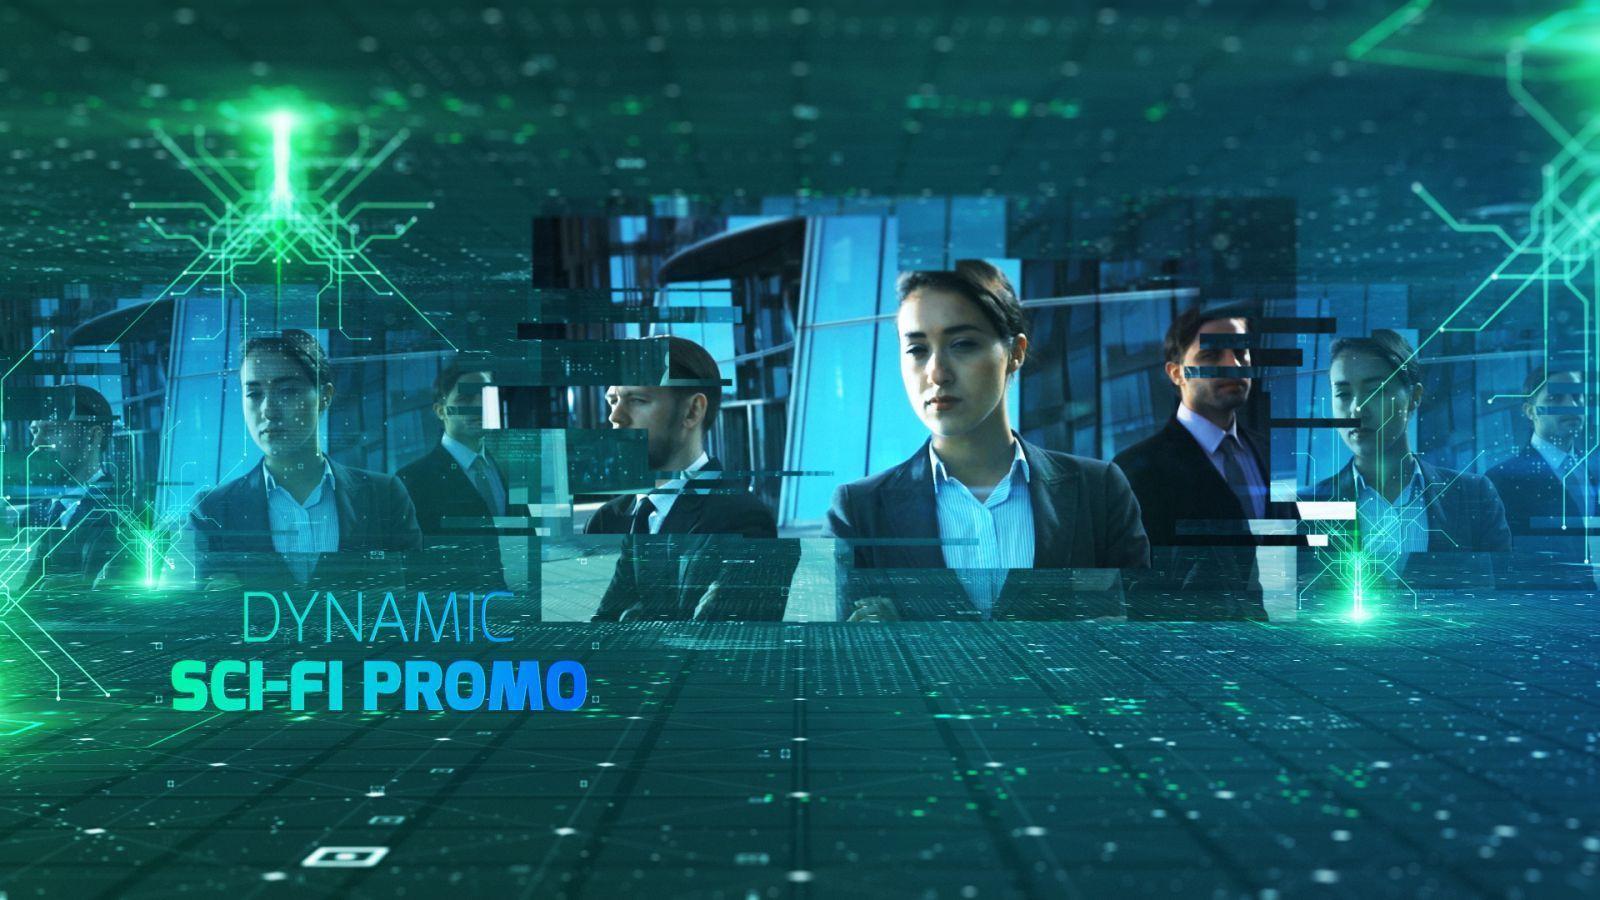 Dynamic Sci-fi Promo